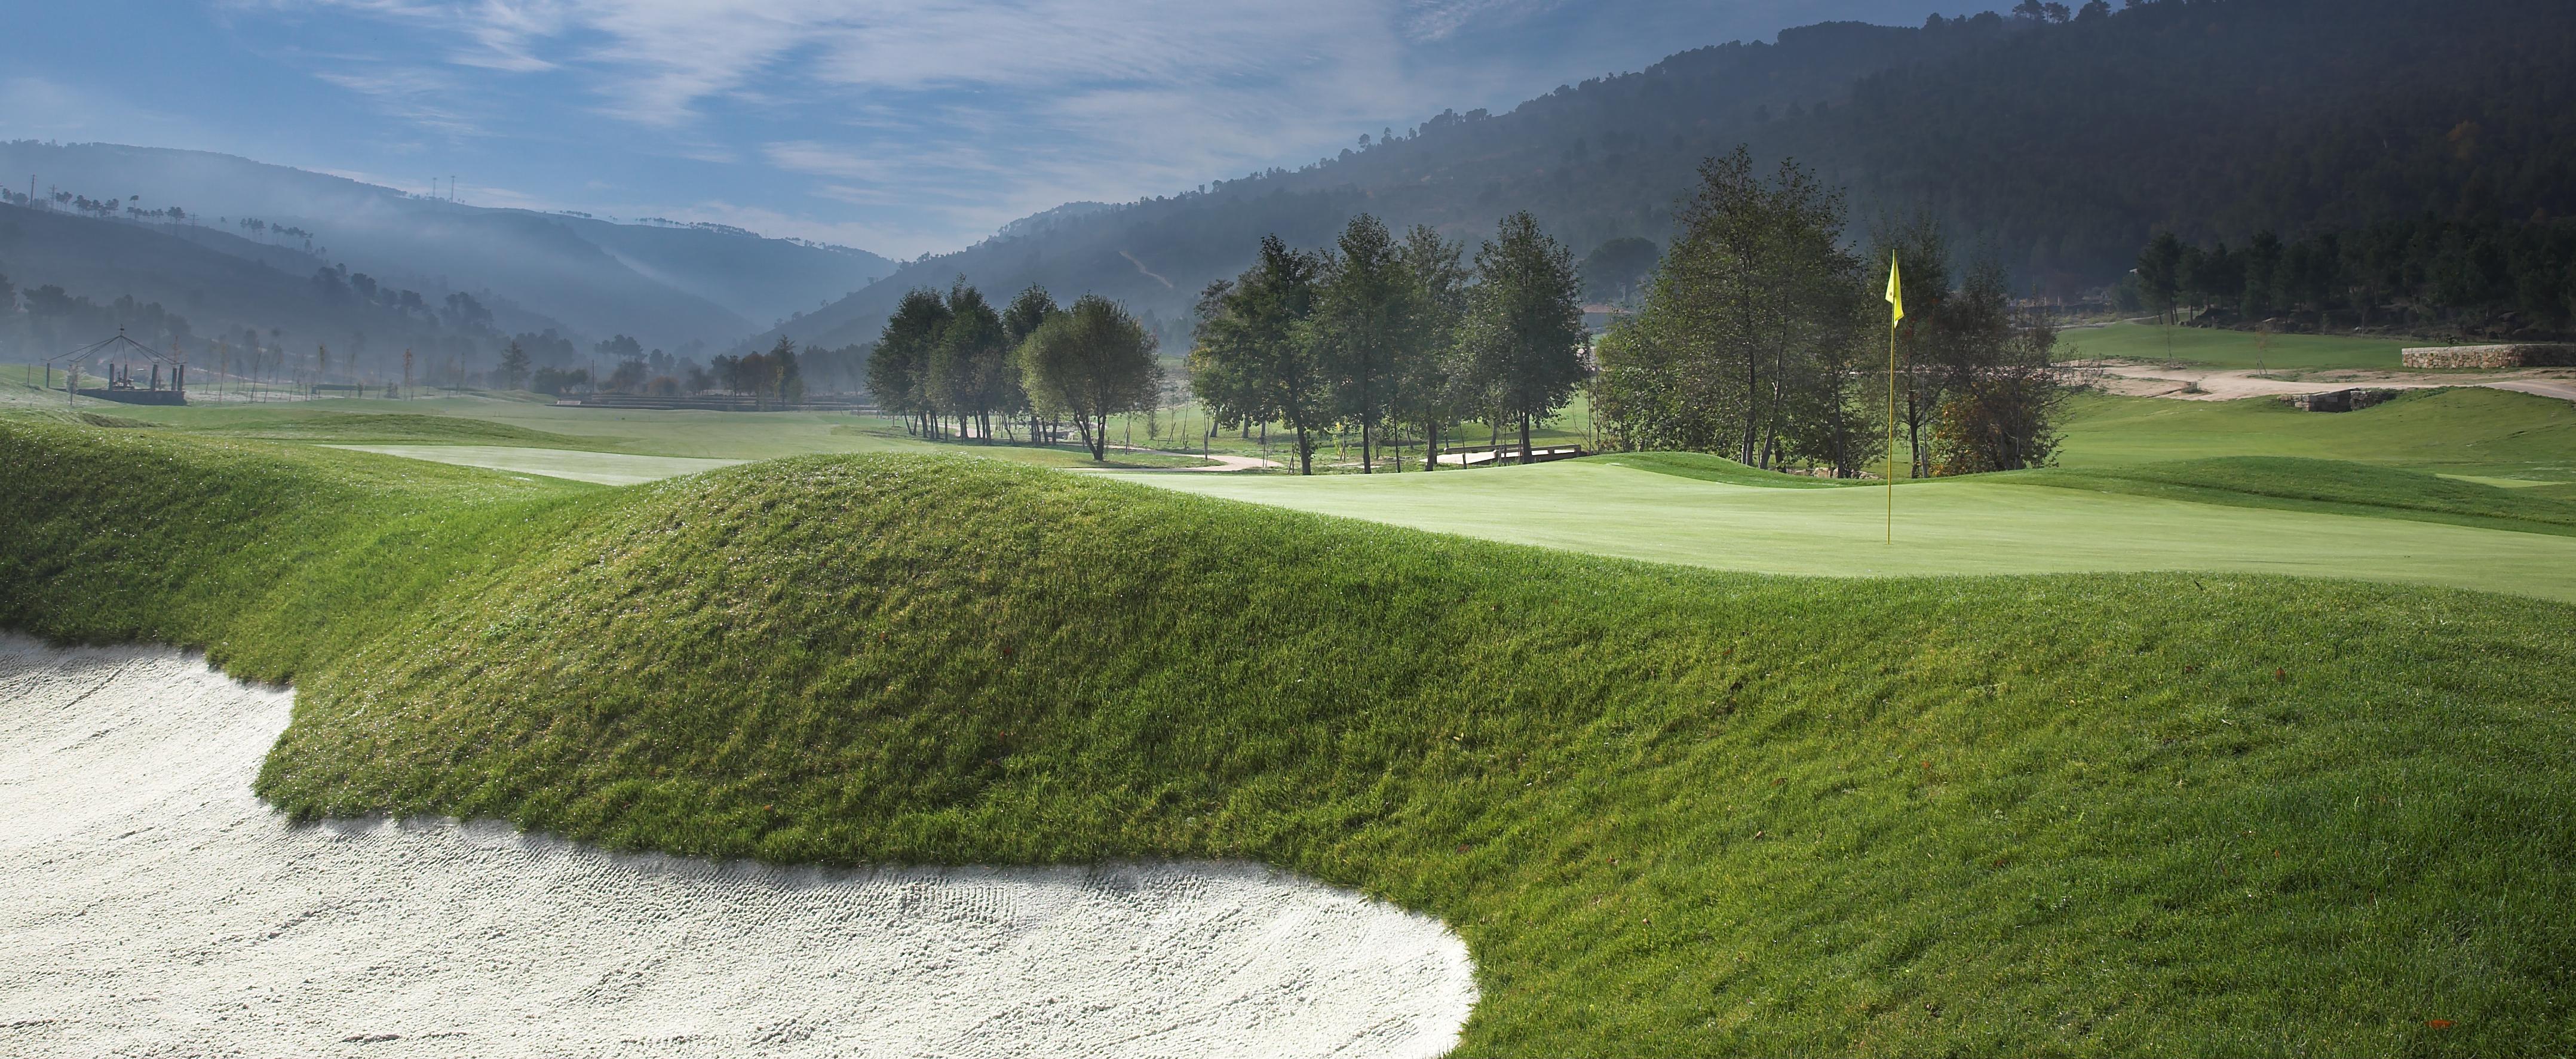 vidago-palace-golf-course